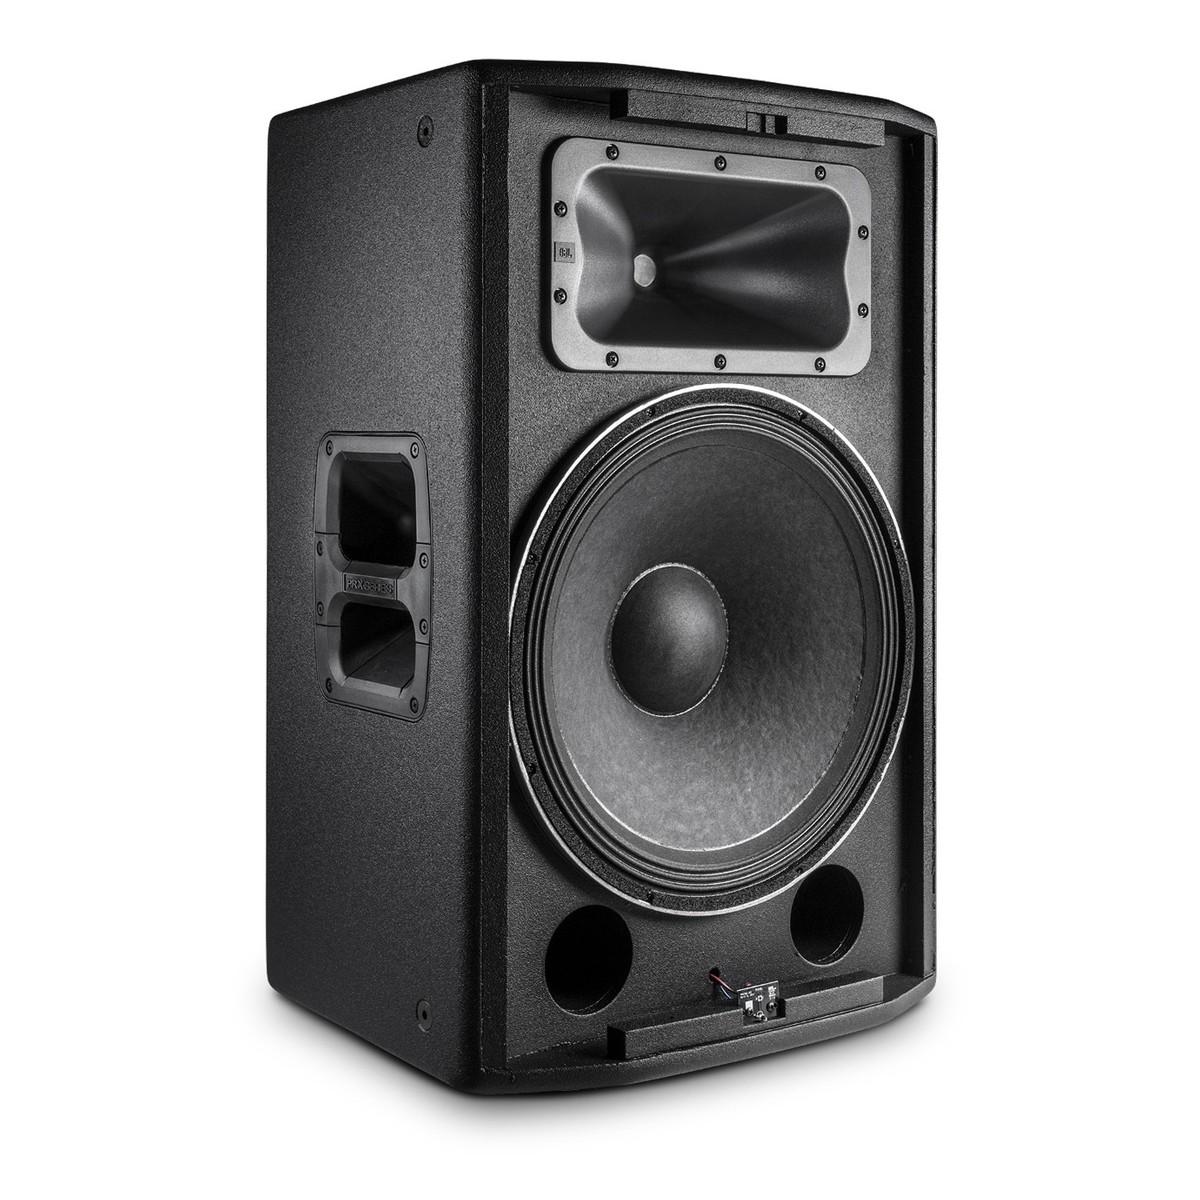 Dating jbl speakers